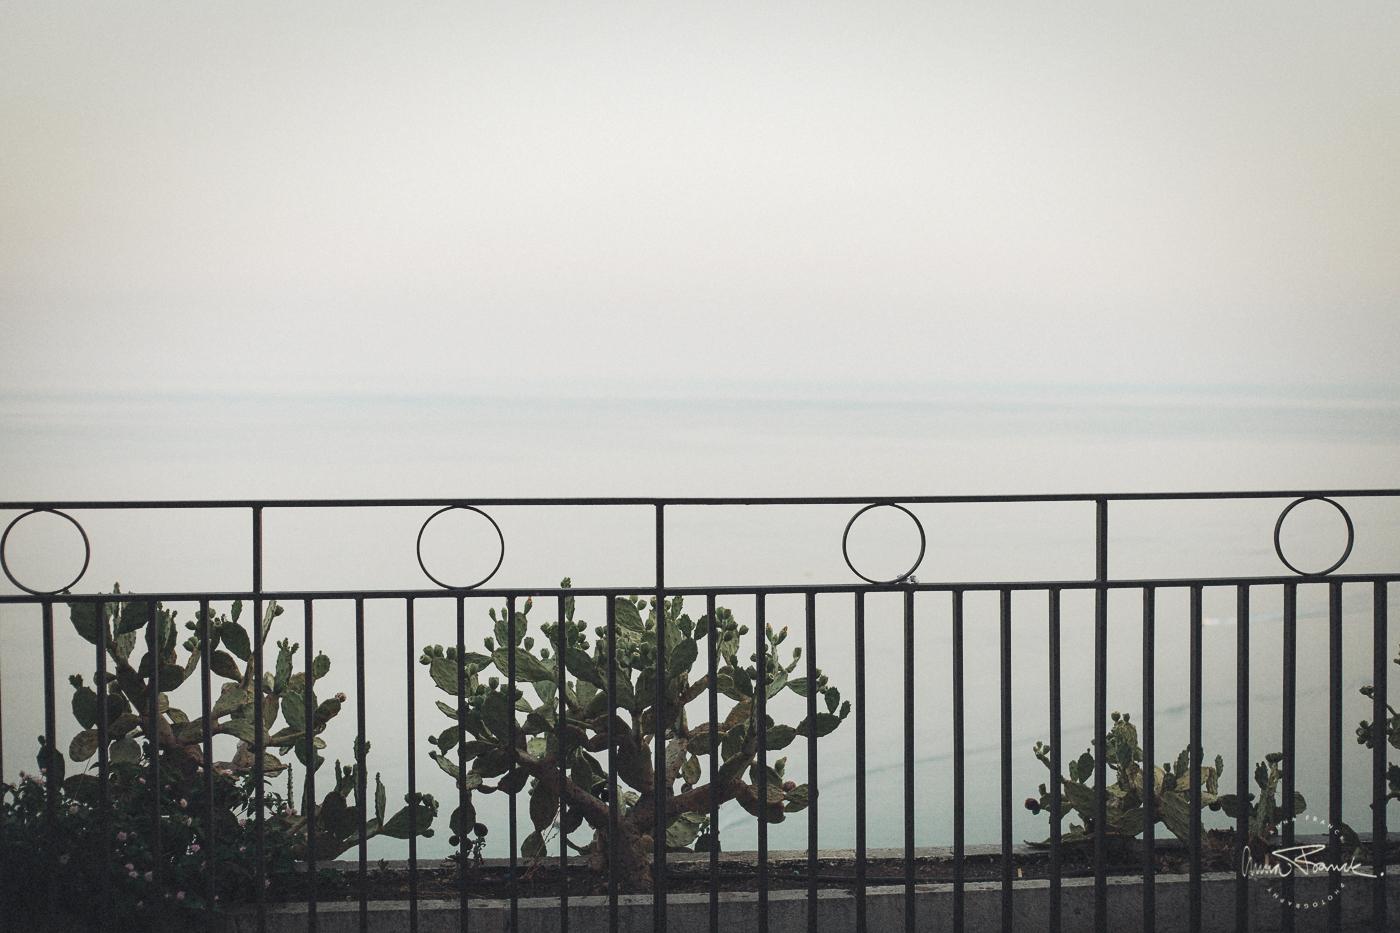 anna, franck, photography, sicilia, sicily, taormina, travelphotography, lifestyle, urban, architecture, details, moments, dogs, summer, stockholm, photographer, sunset